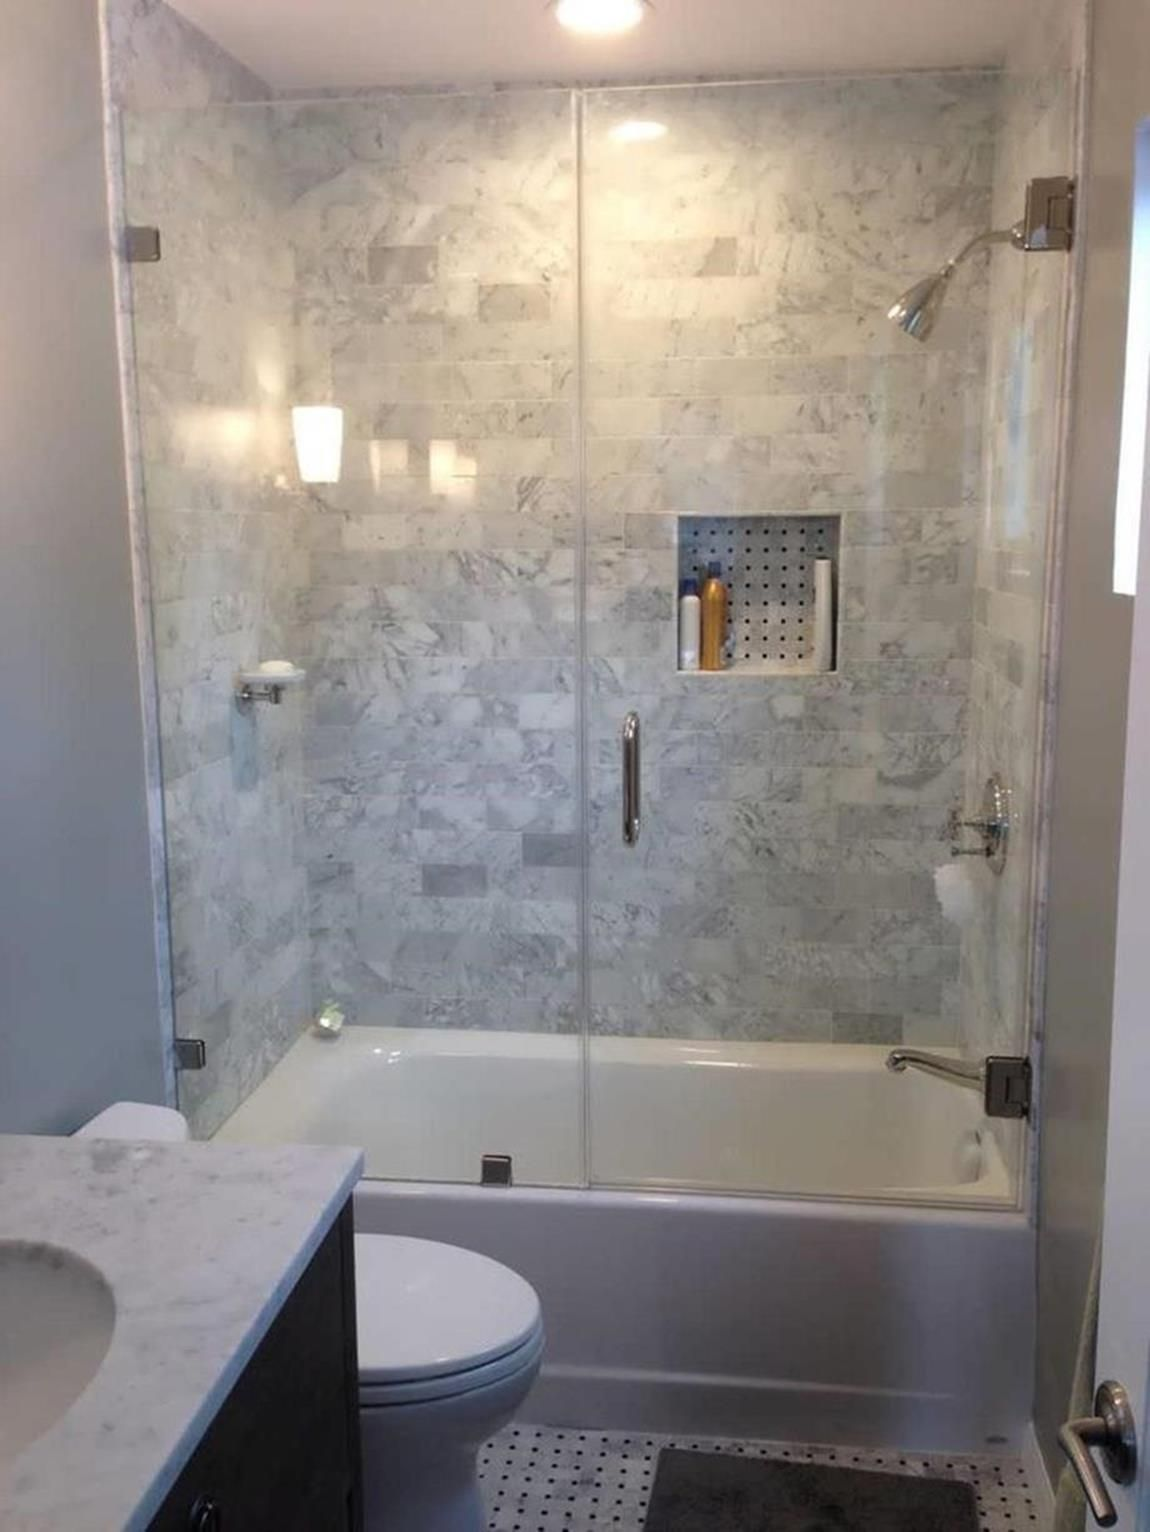 27 Adorable Spa Bathroom Ideas For Small Bathrooms Bathroom Design Small Bathroom Design